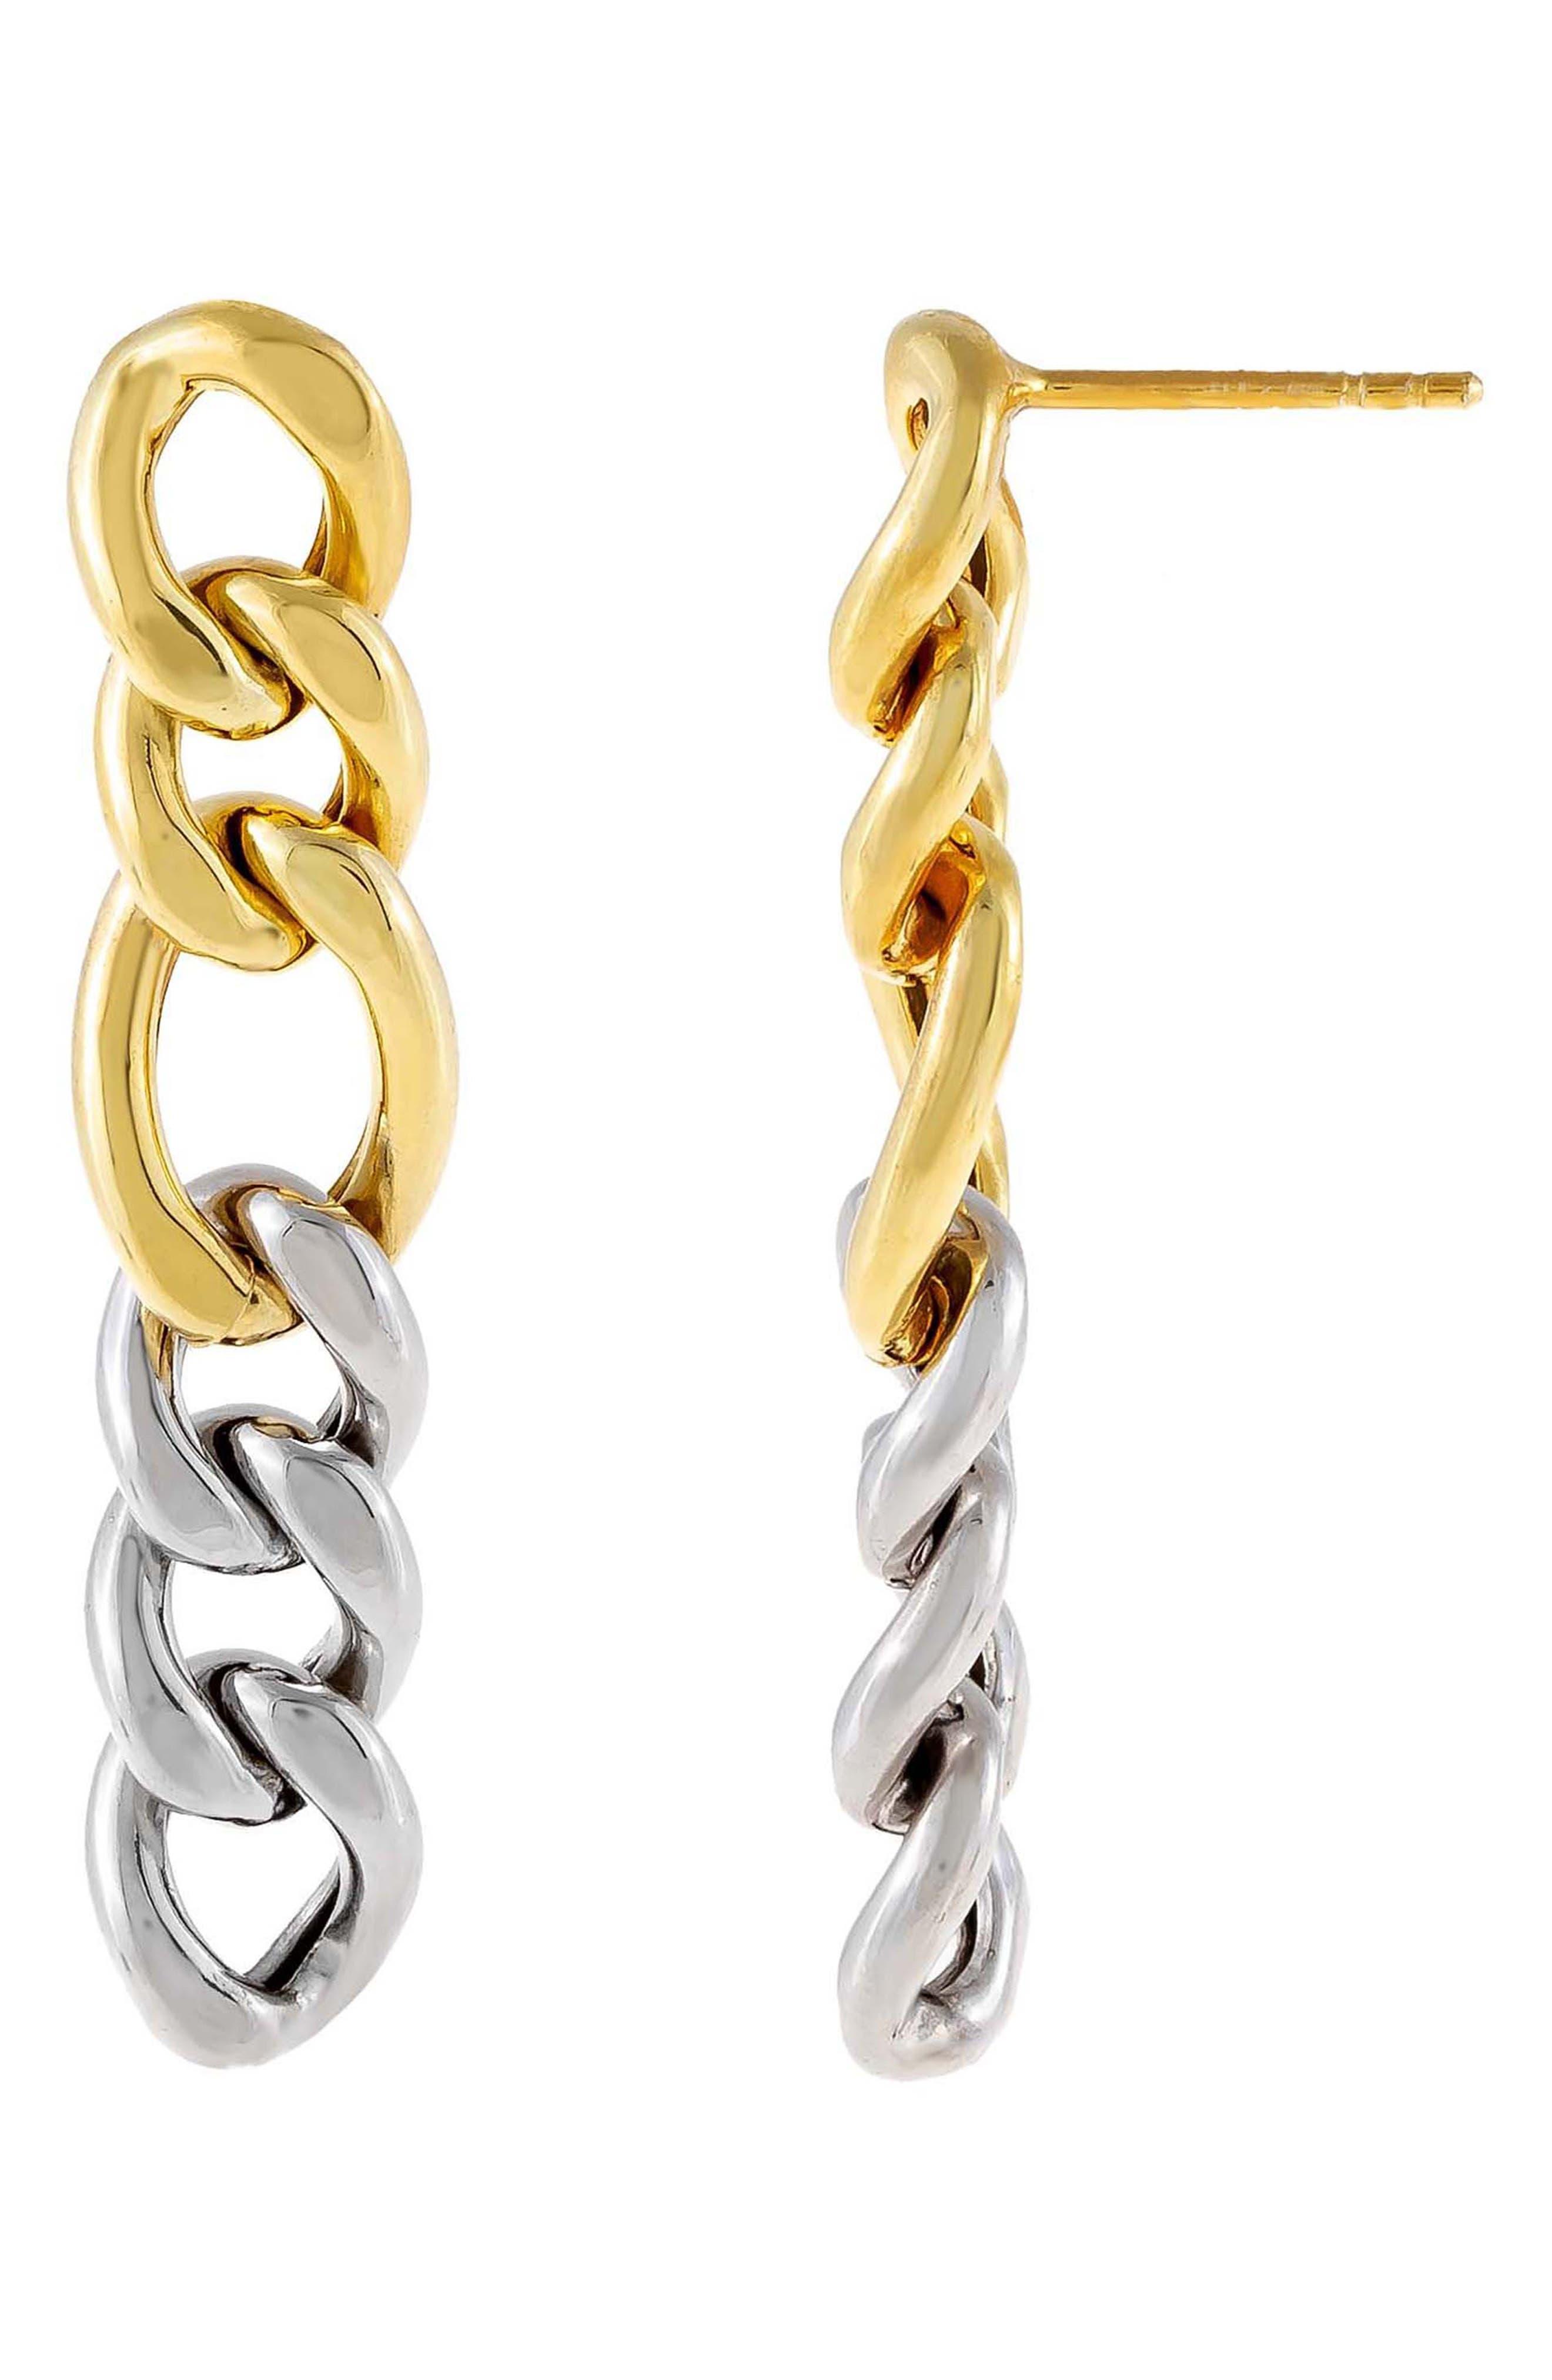 Women's Adina's Jewels Two-Tone Miami Curb Chain Drop Earrings